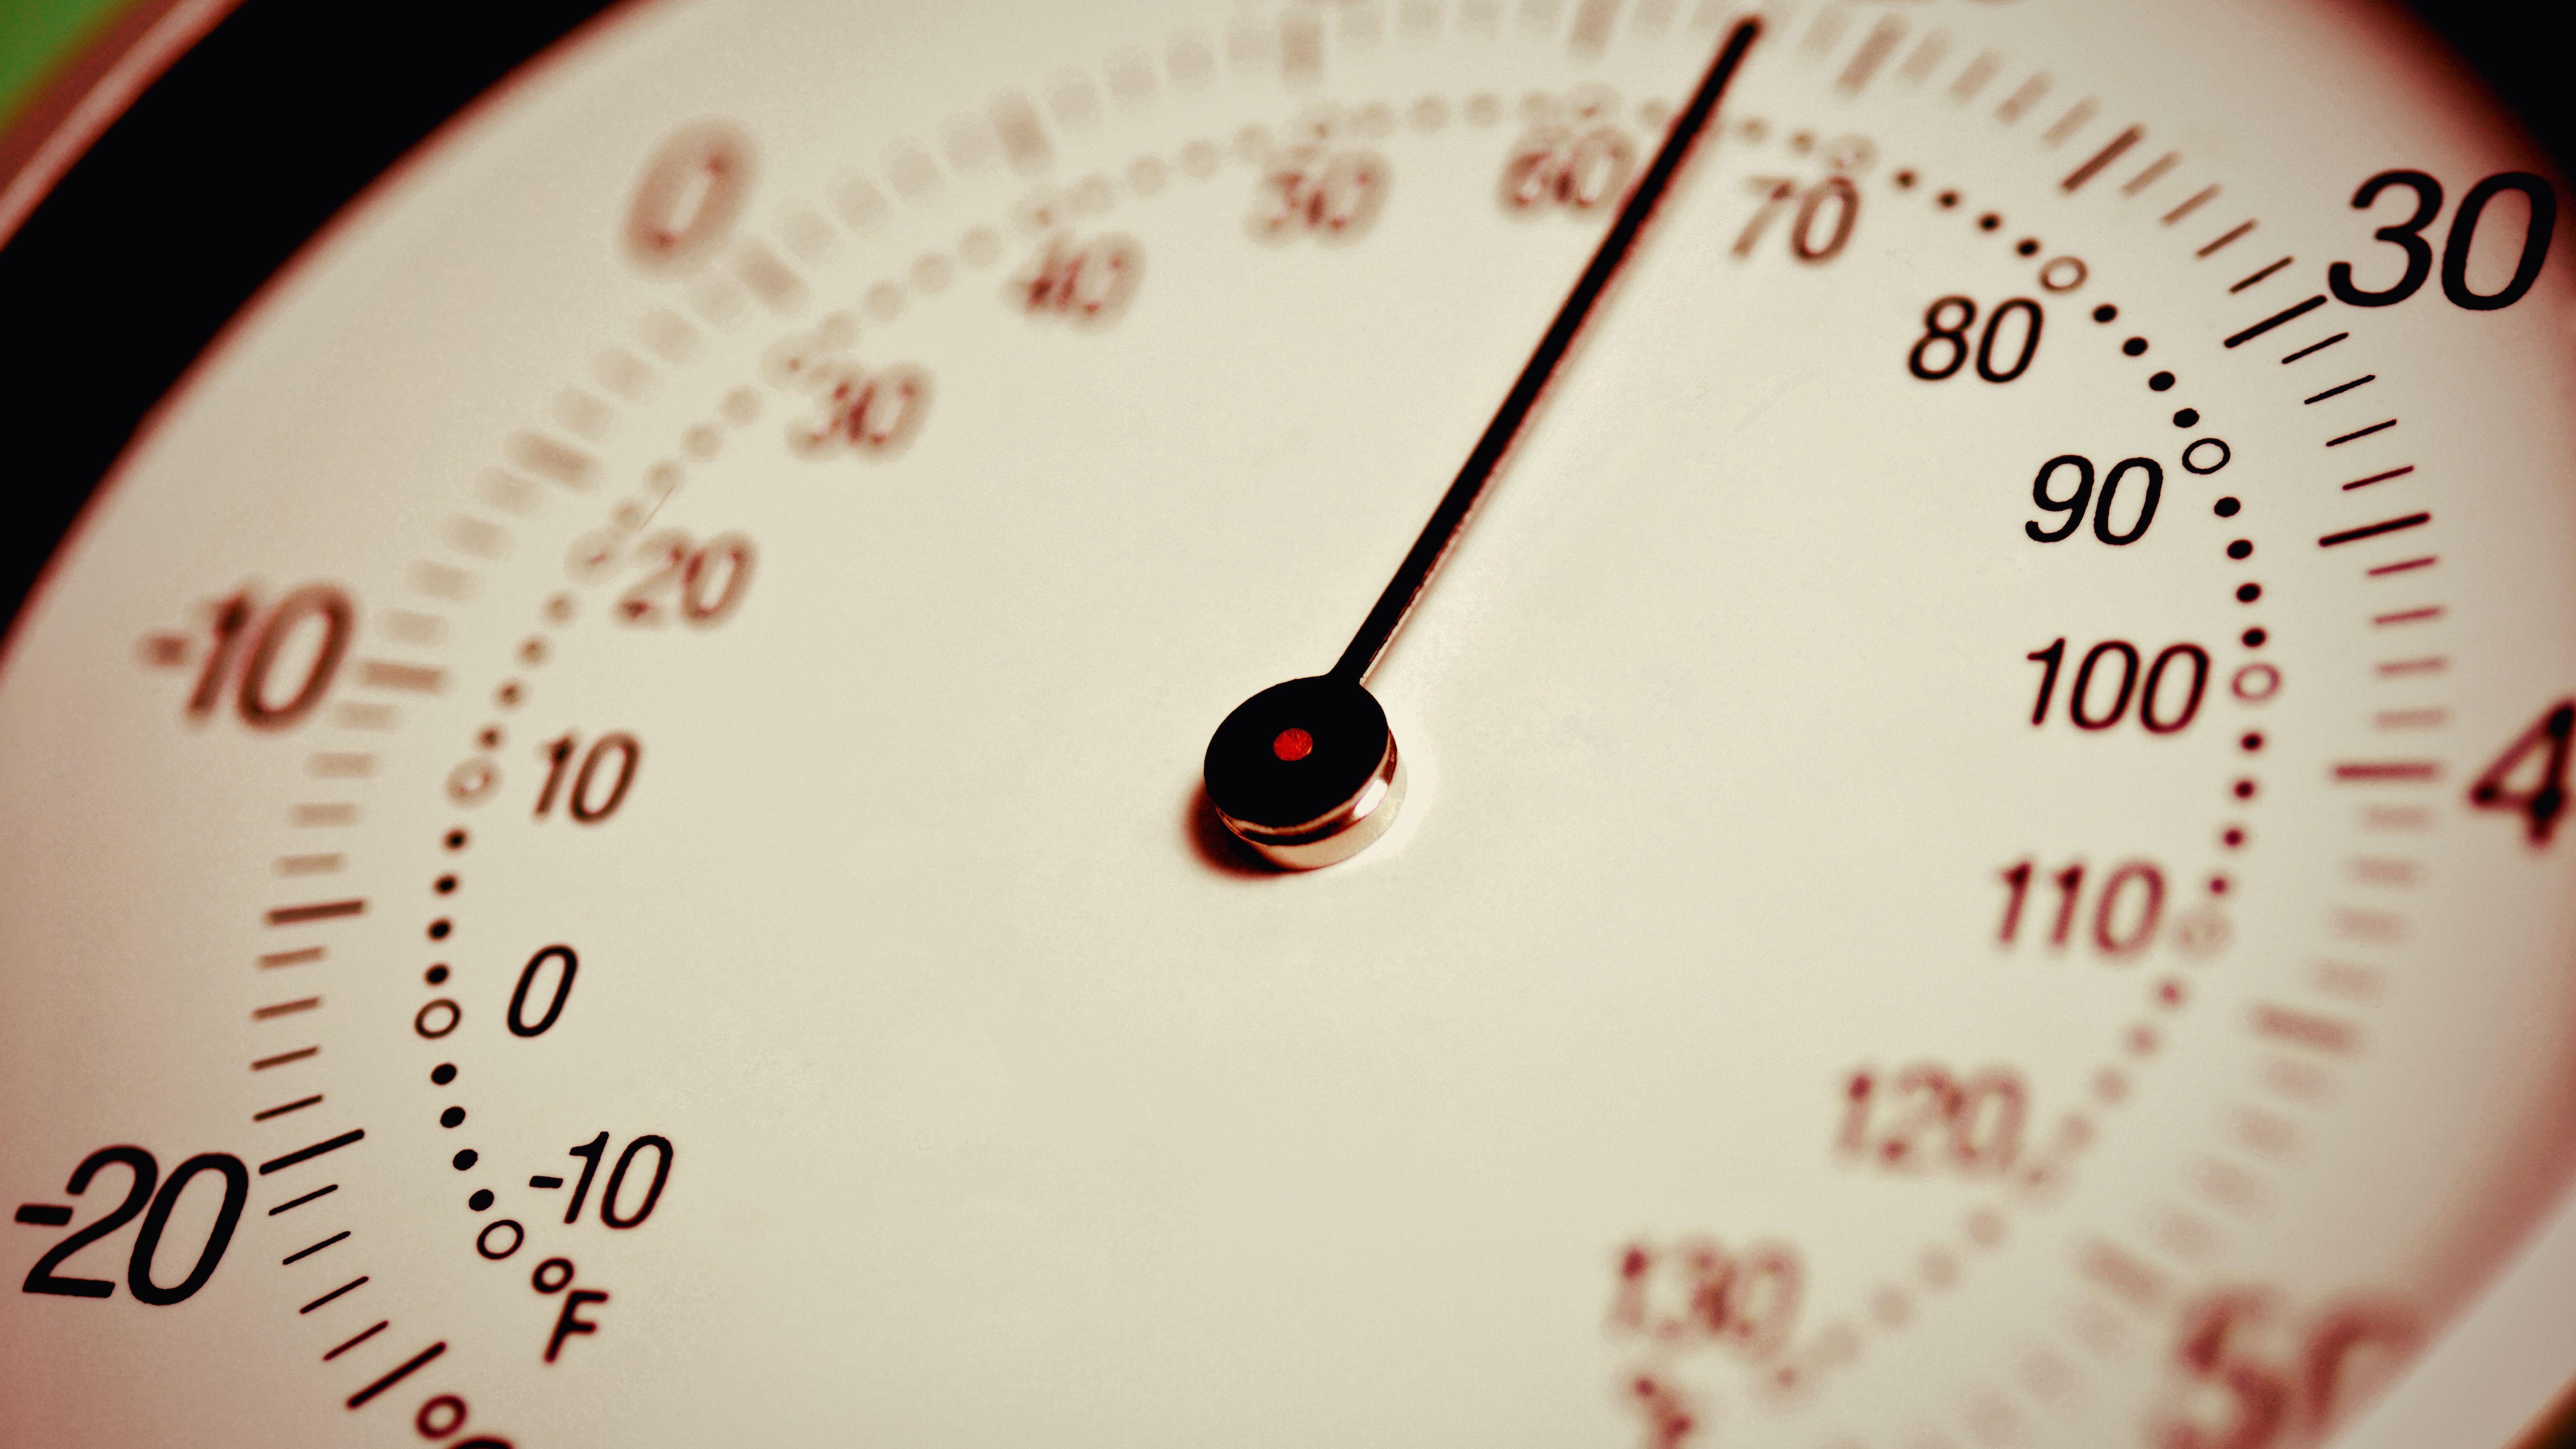 How to Convert Celcius to Farenheit (°C to °F)